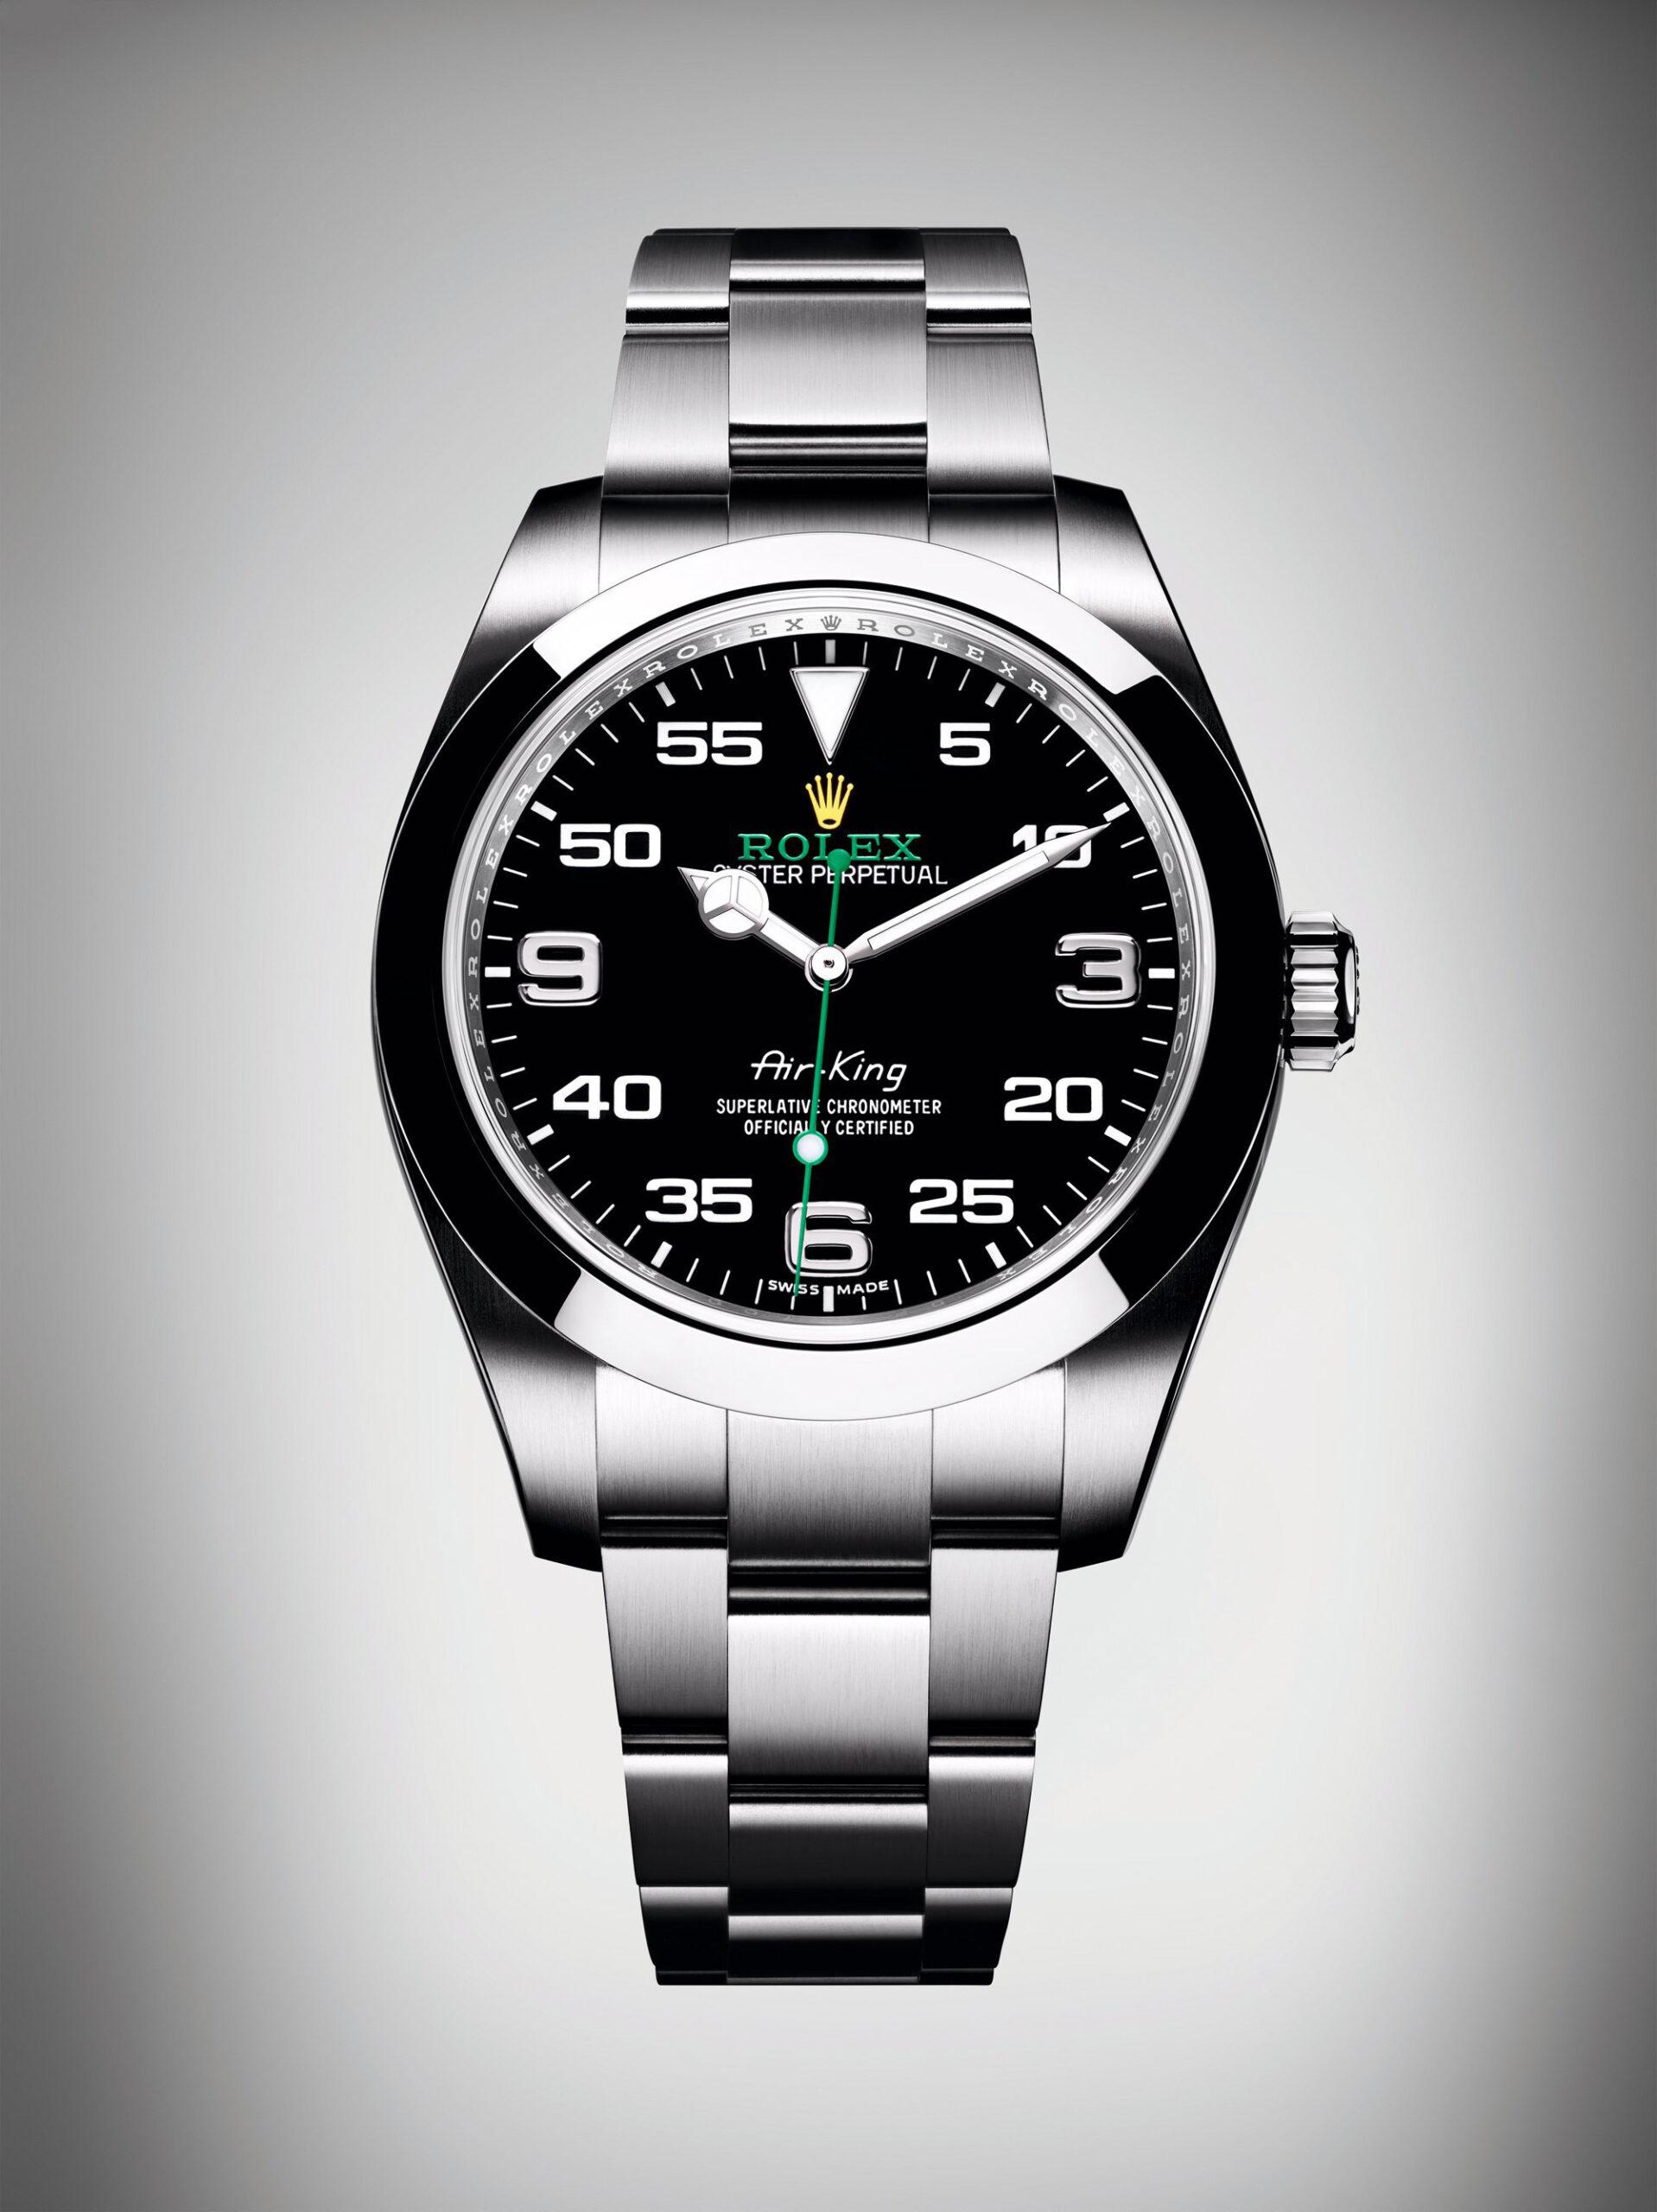 rolex air king 116900 discontinued 2020 - Rolex Baselworld 2020 - Rolex 2020 Predictions